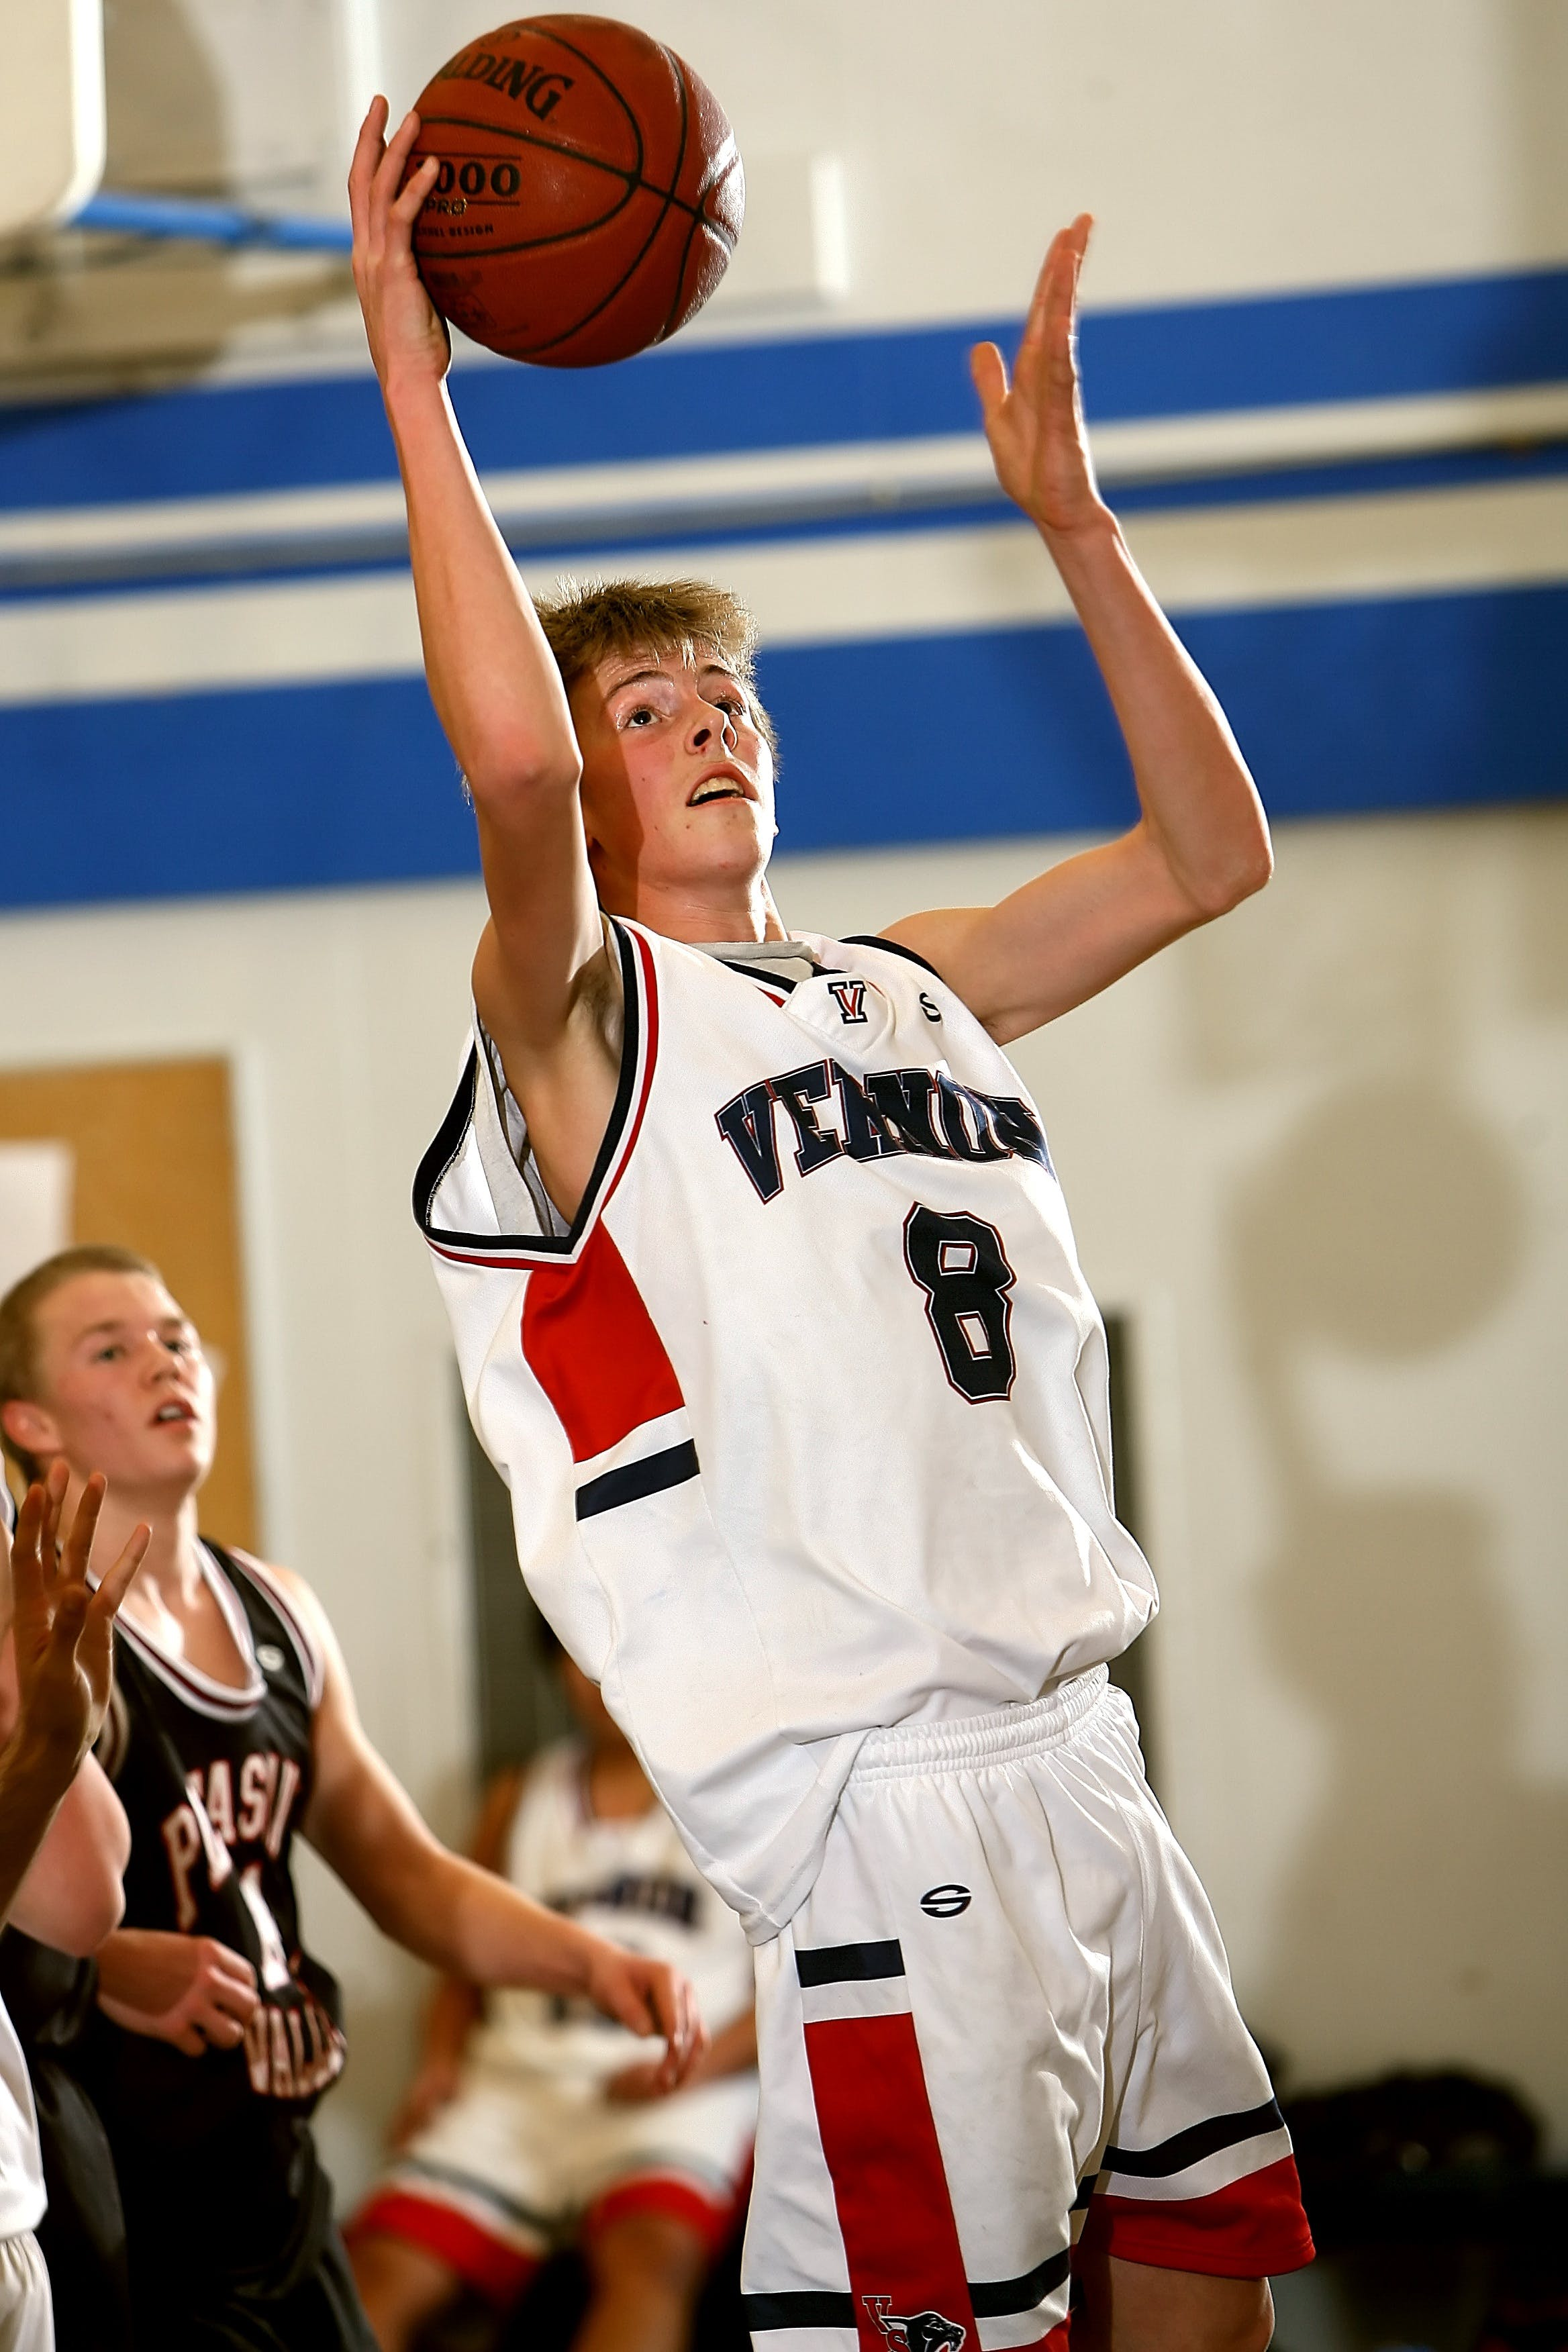 Free stock photo of sport, ball, tall, jump